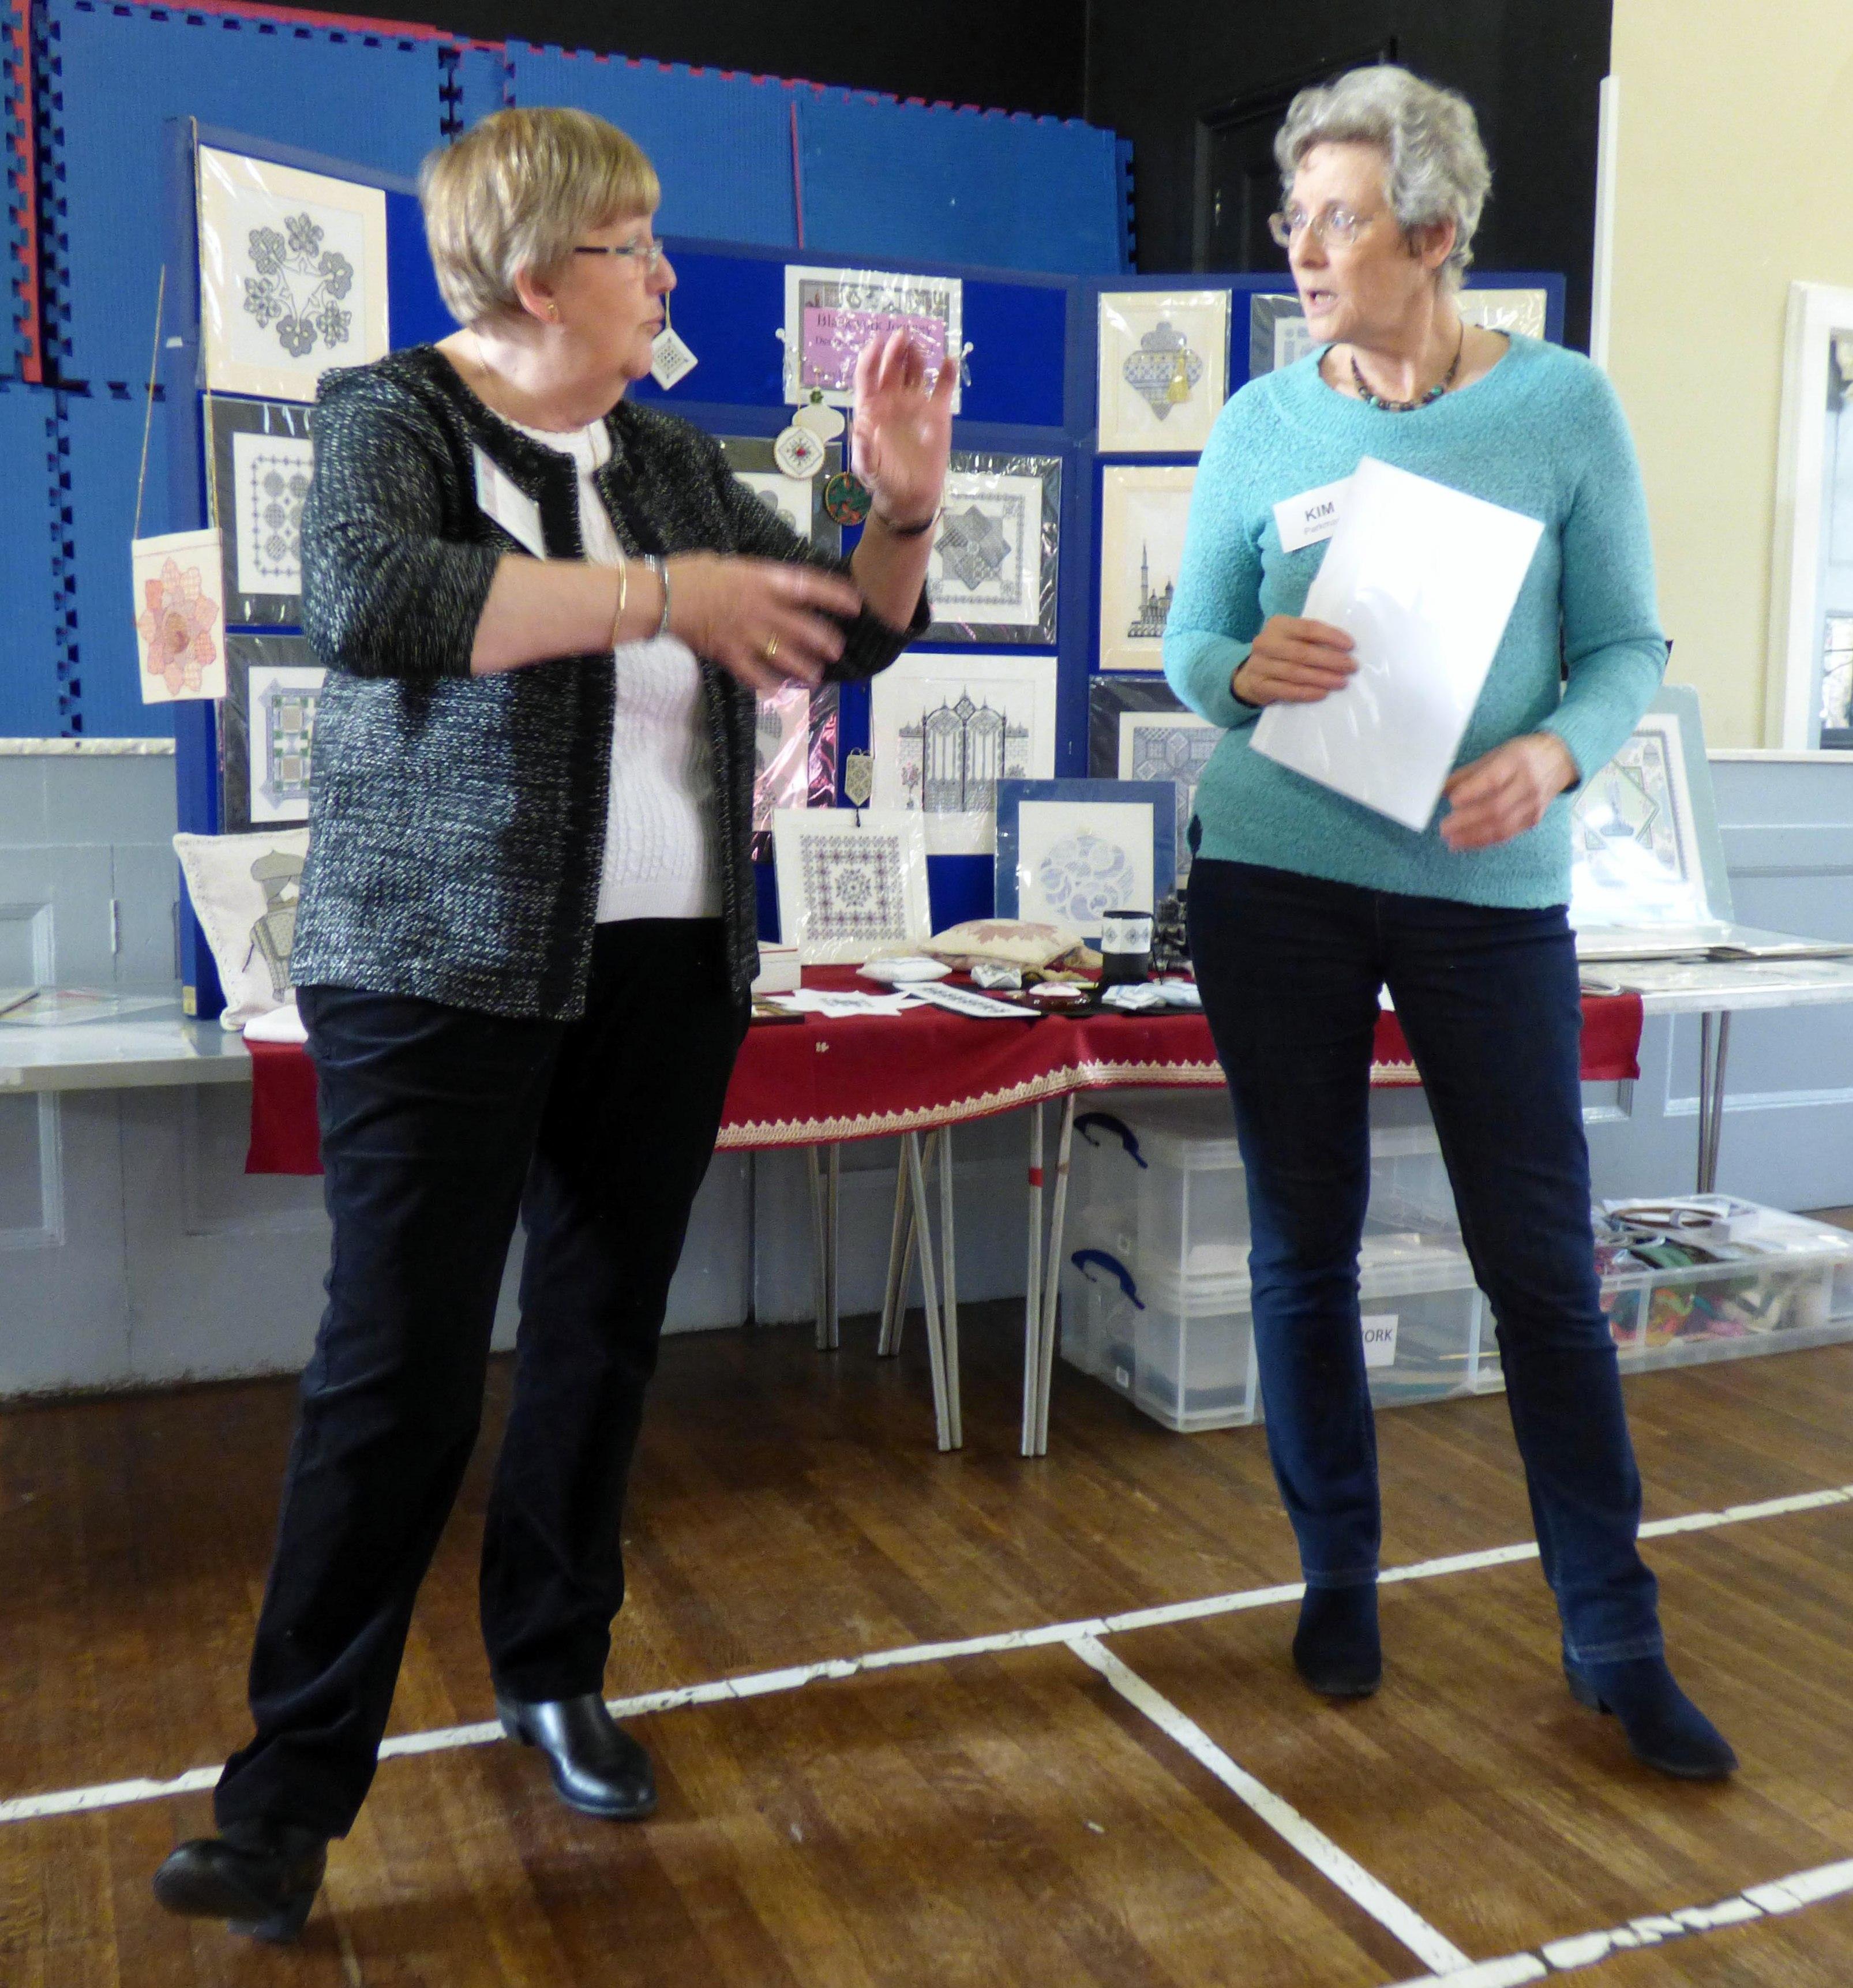 Elizabeth Almond with Kim at Blackwork with Elizabeth Almond at Merseyside EG, Nov 2017